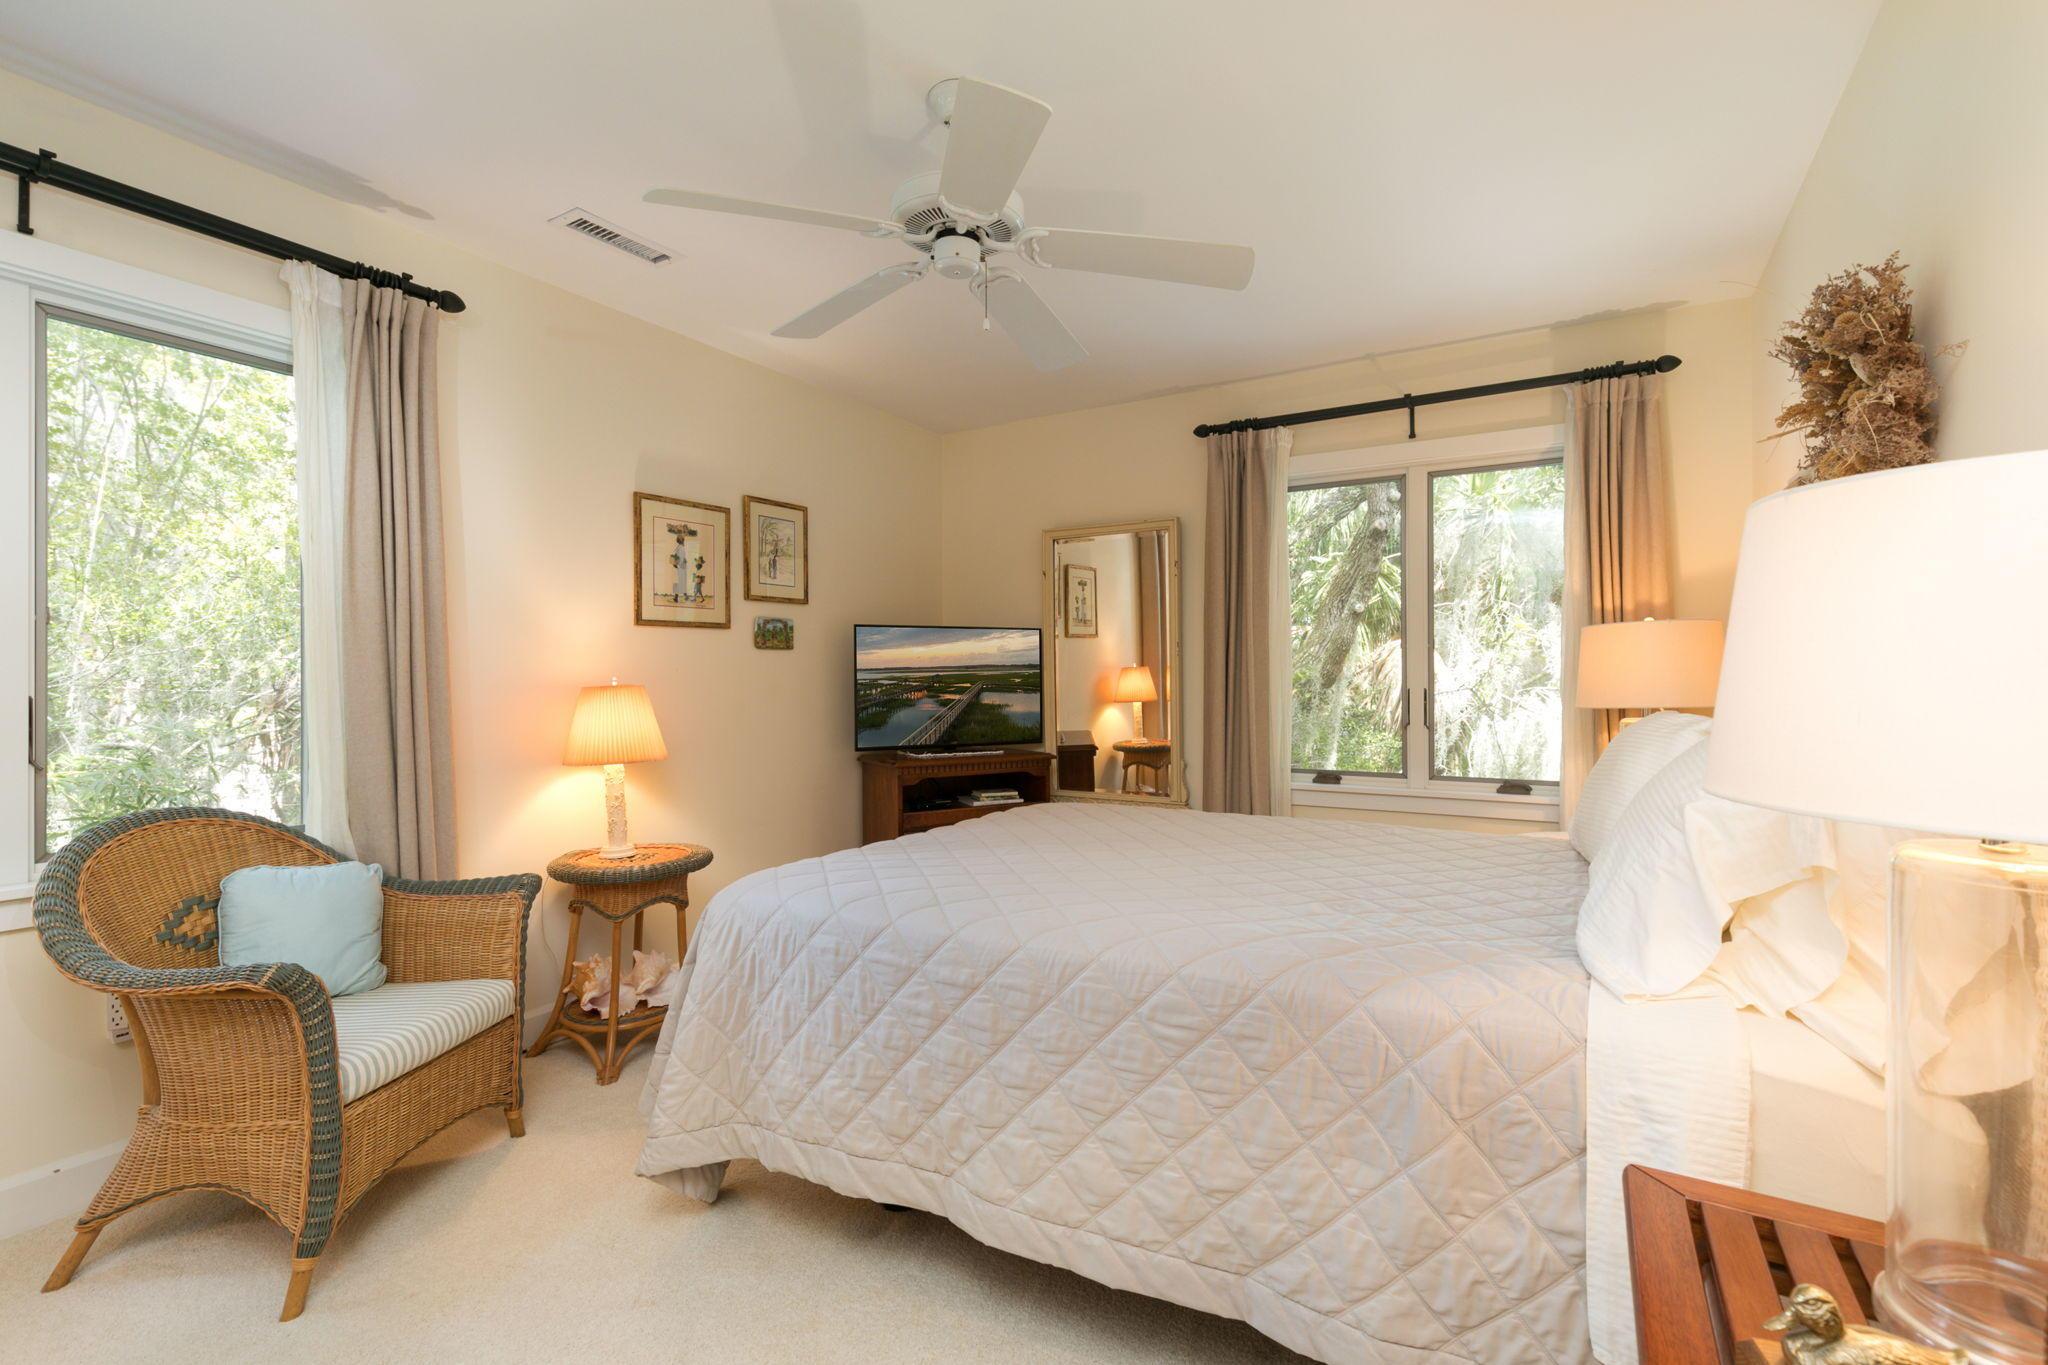 Seabrook Island Homes For Sale - 3360 Seabrook Island, Seabrook Island, SC - 1